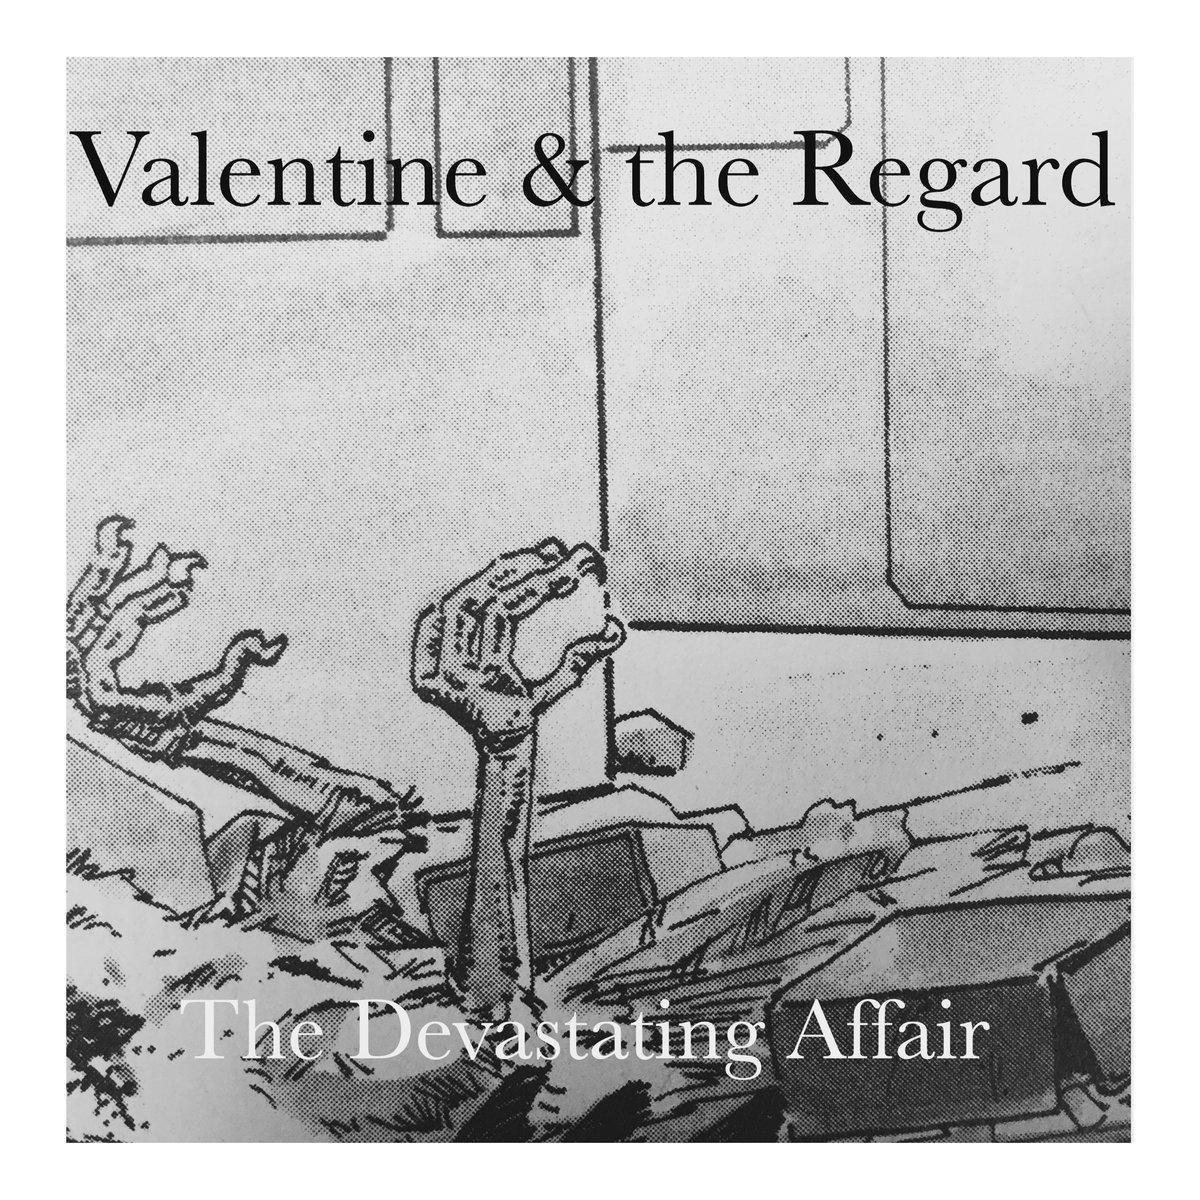 Valentine & the Regard – The Devastating Affair